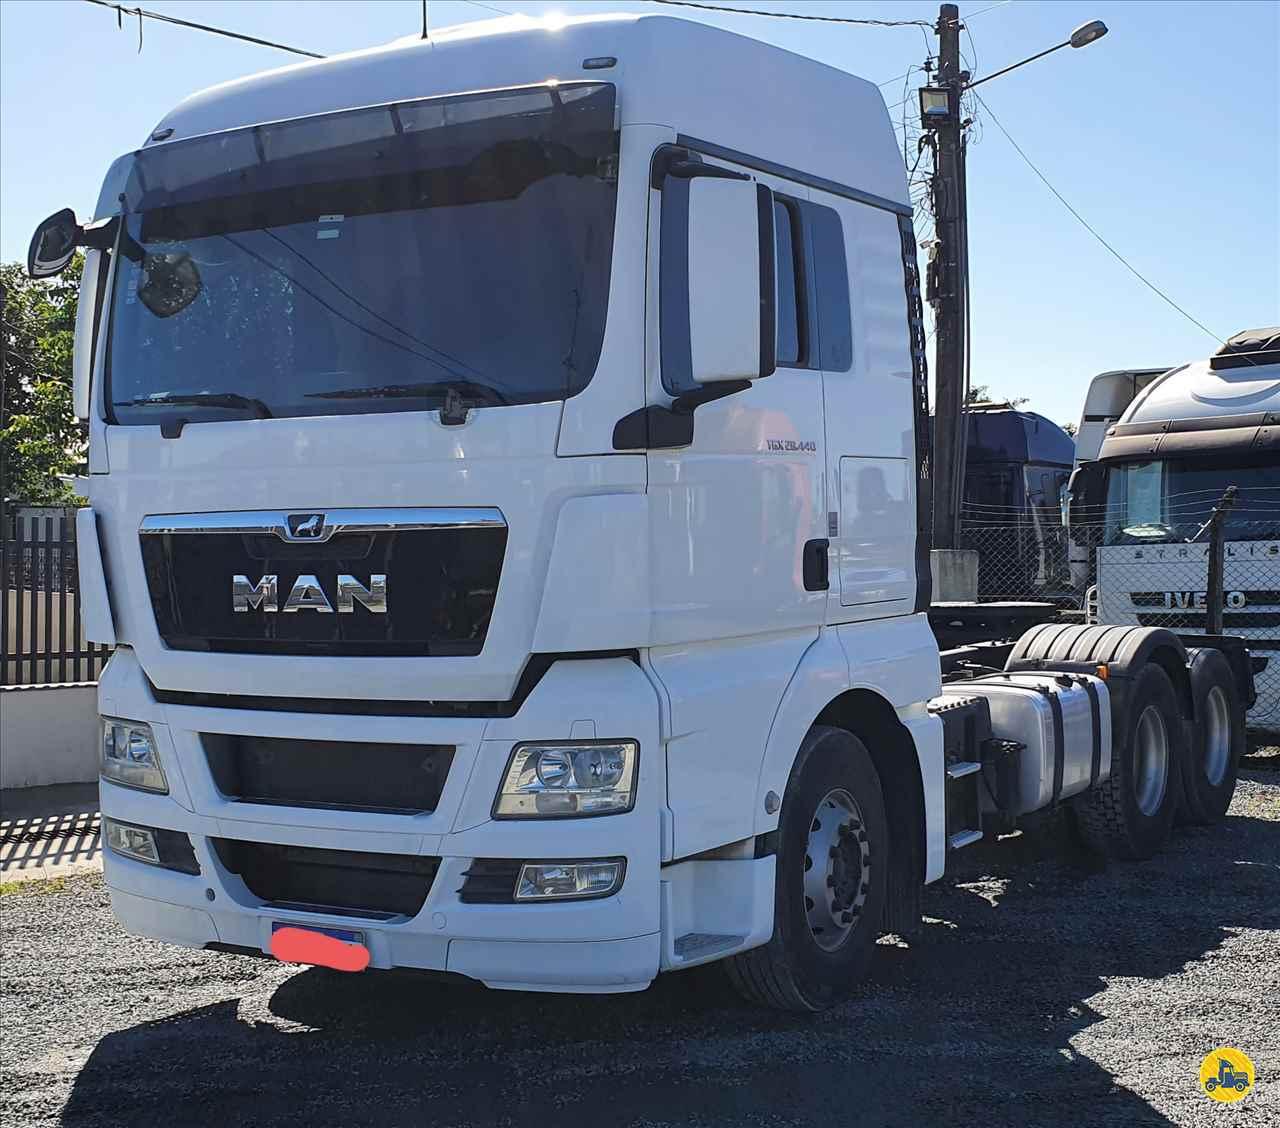 CAMINHAO MAN TGX 28 440 Cavalo Mecânico Truck 6x2 Trevo Caminhões - AGB ITAJAI SANTA CATARINA SC